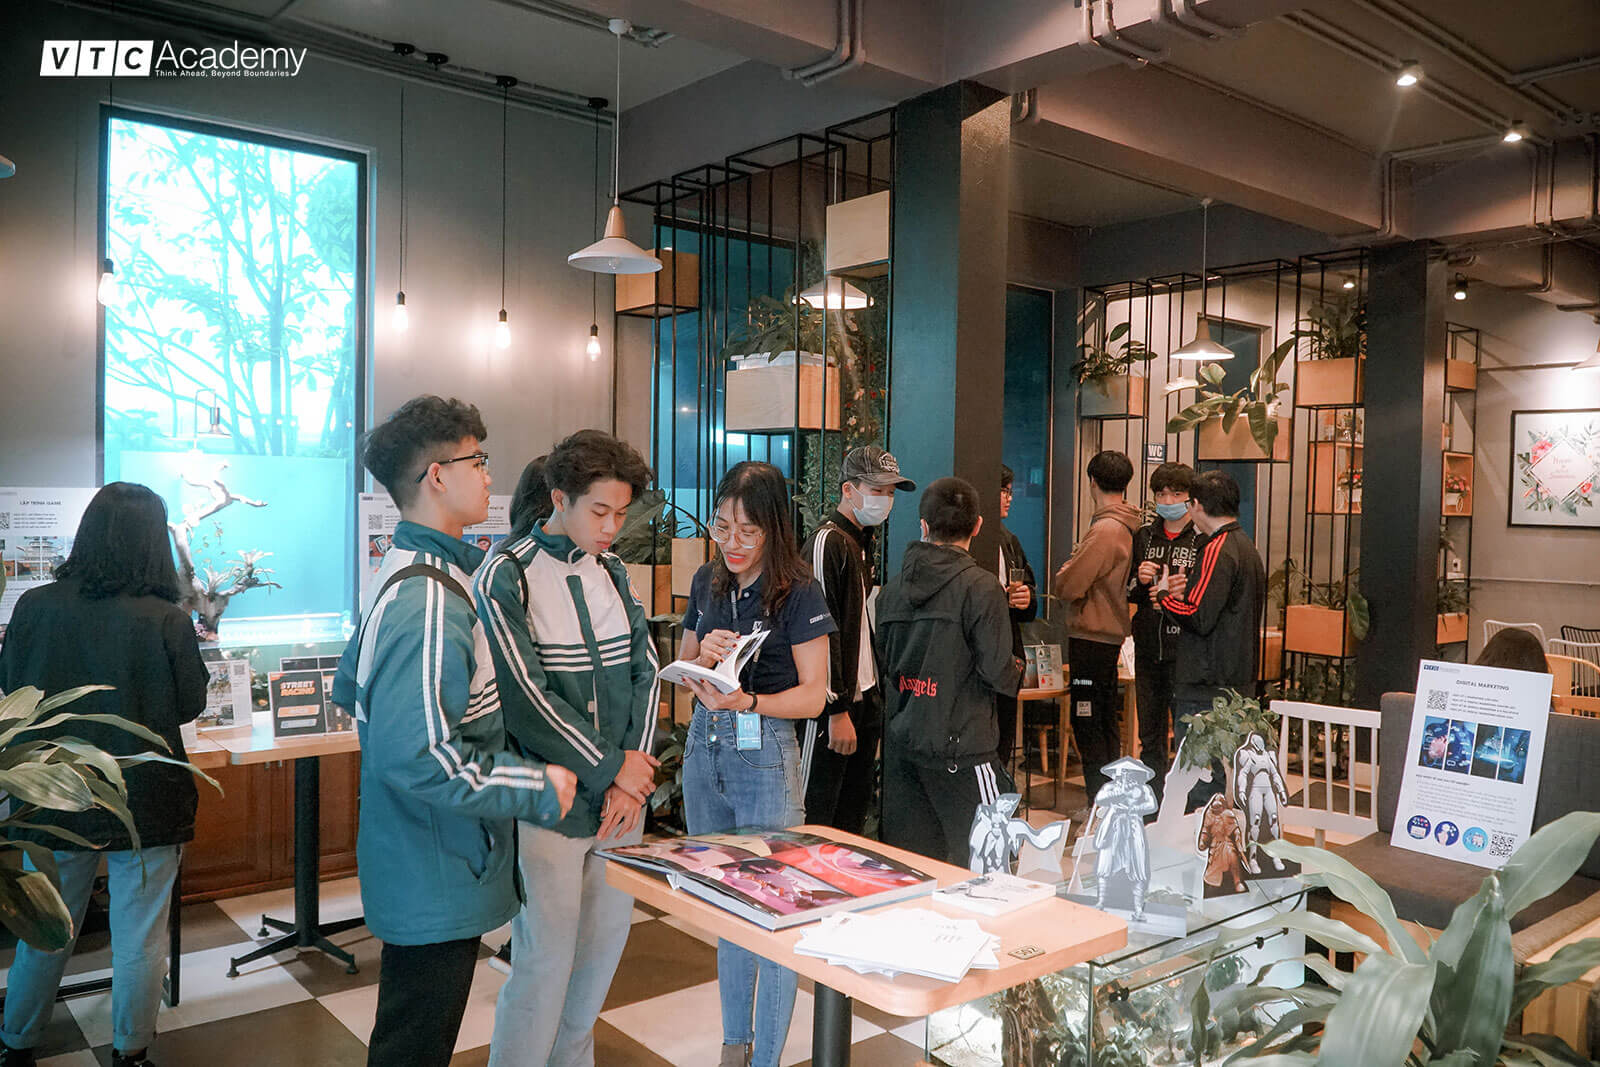 coffee-talk-phu-tho-vtc-academy-4